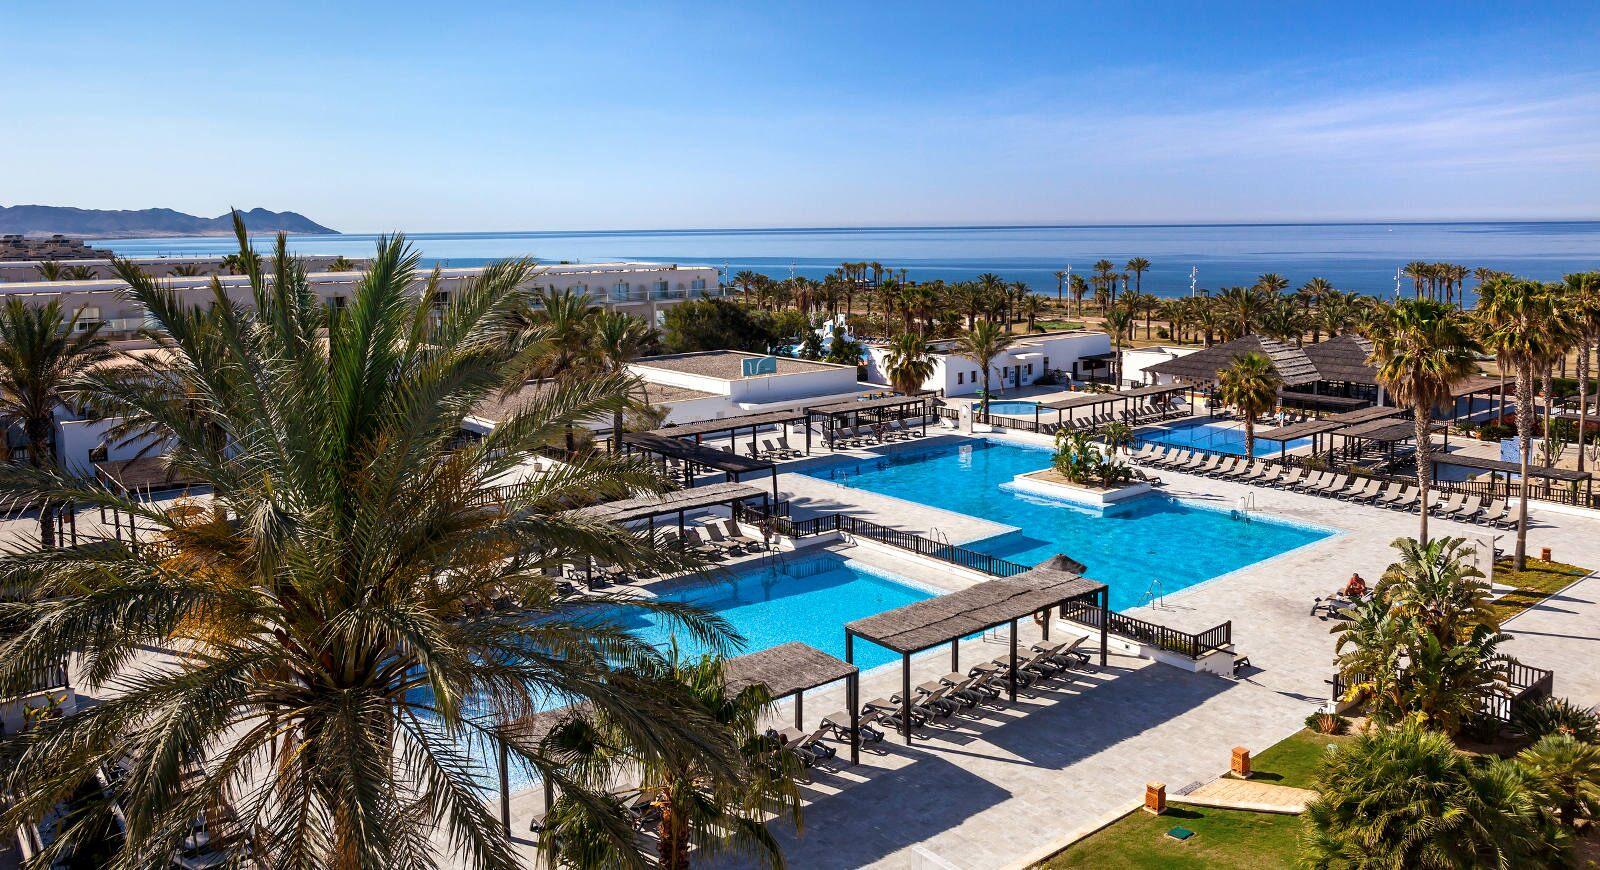 236-swimming-pool-57-hotel-barcelo-cabo-de-gata_tcm20-111655_w1600_n.jpg